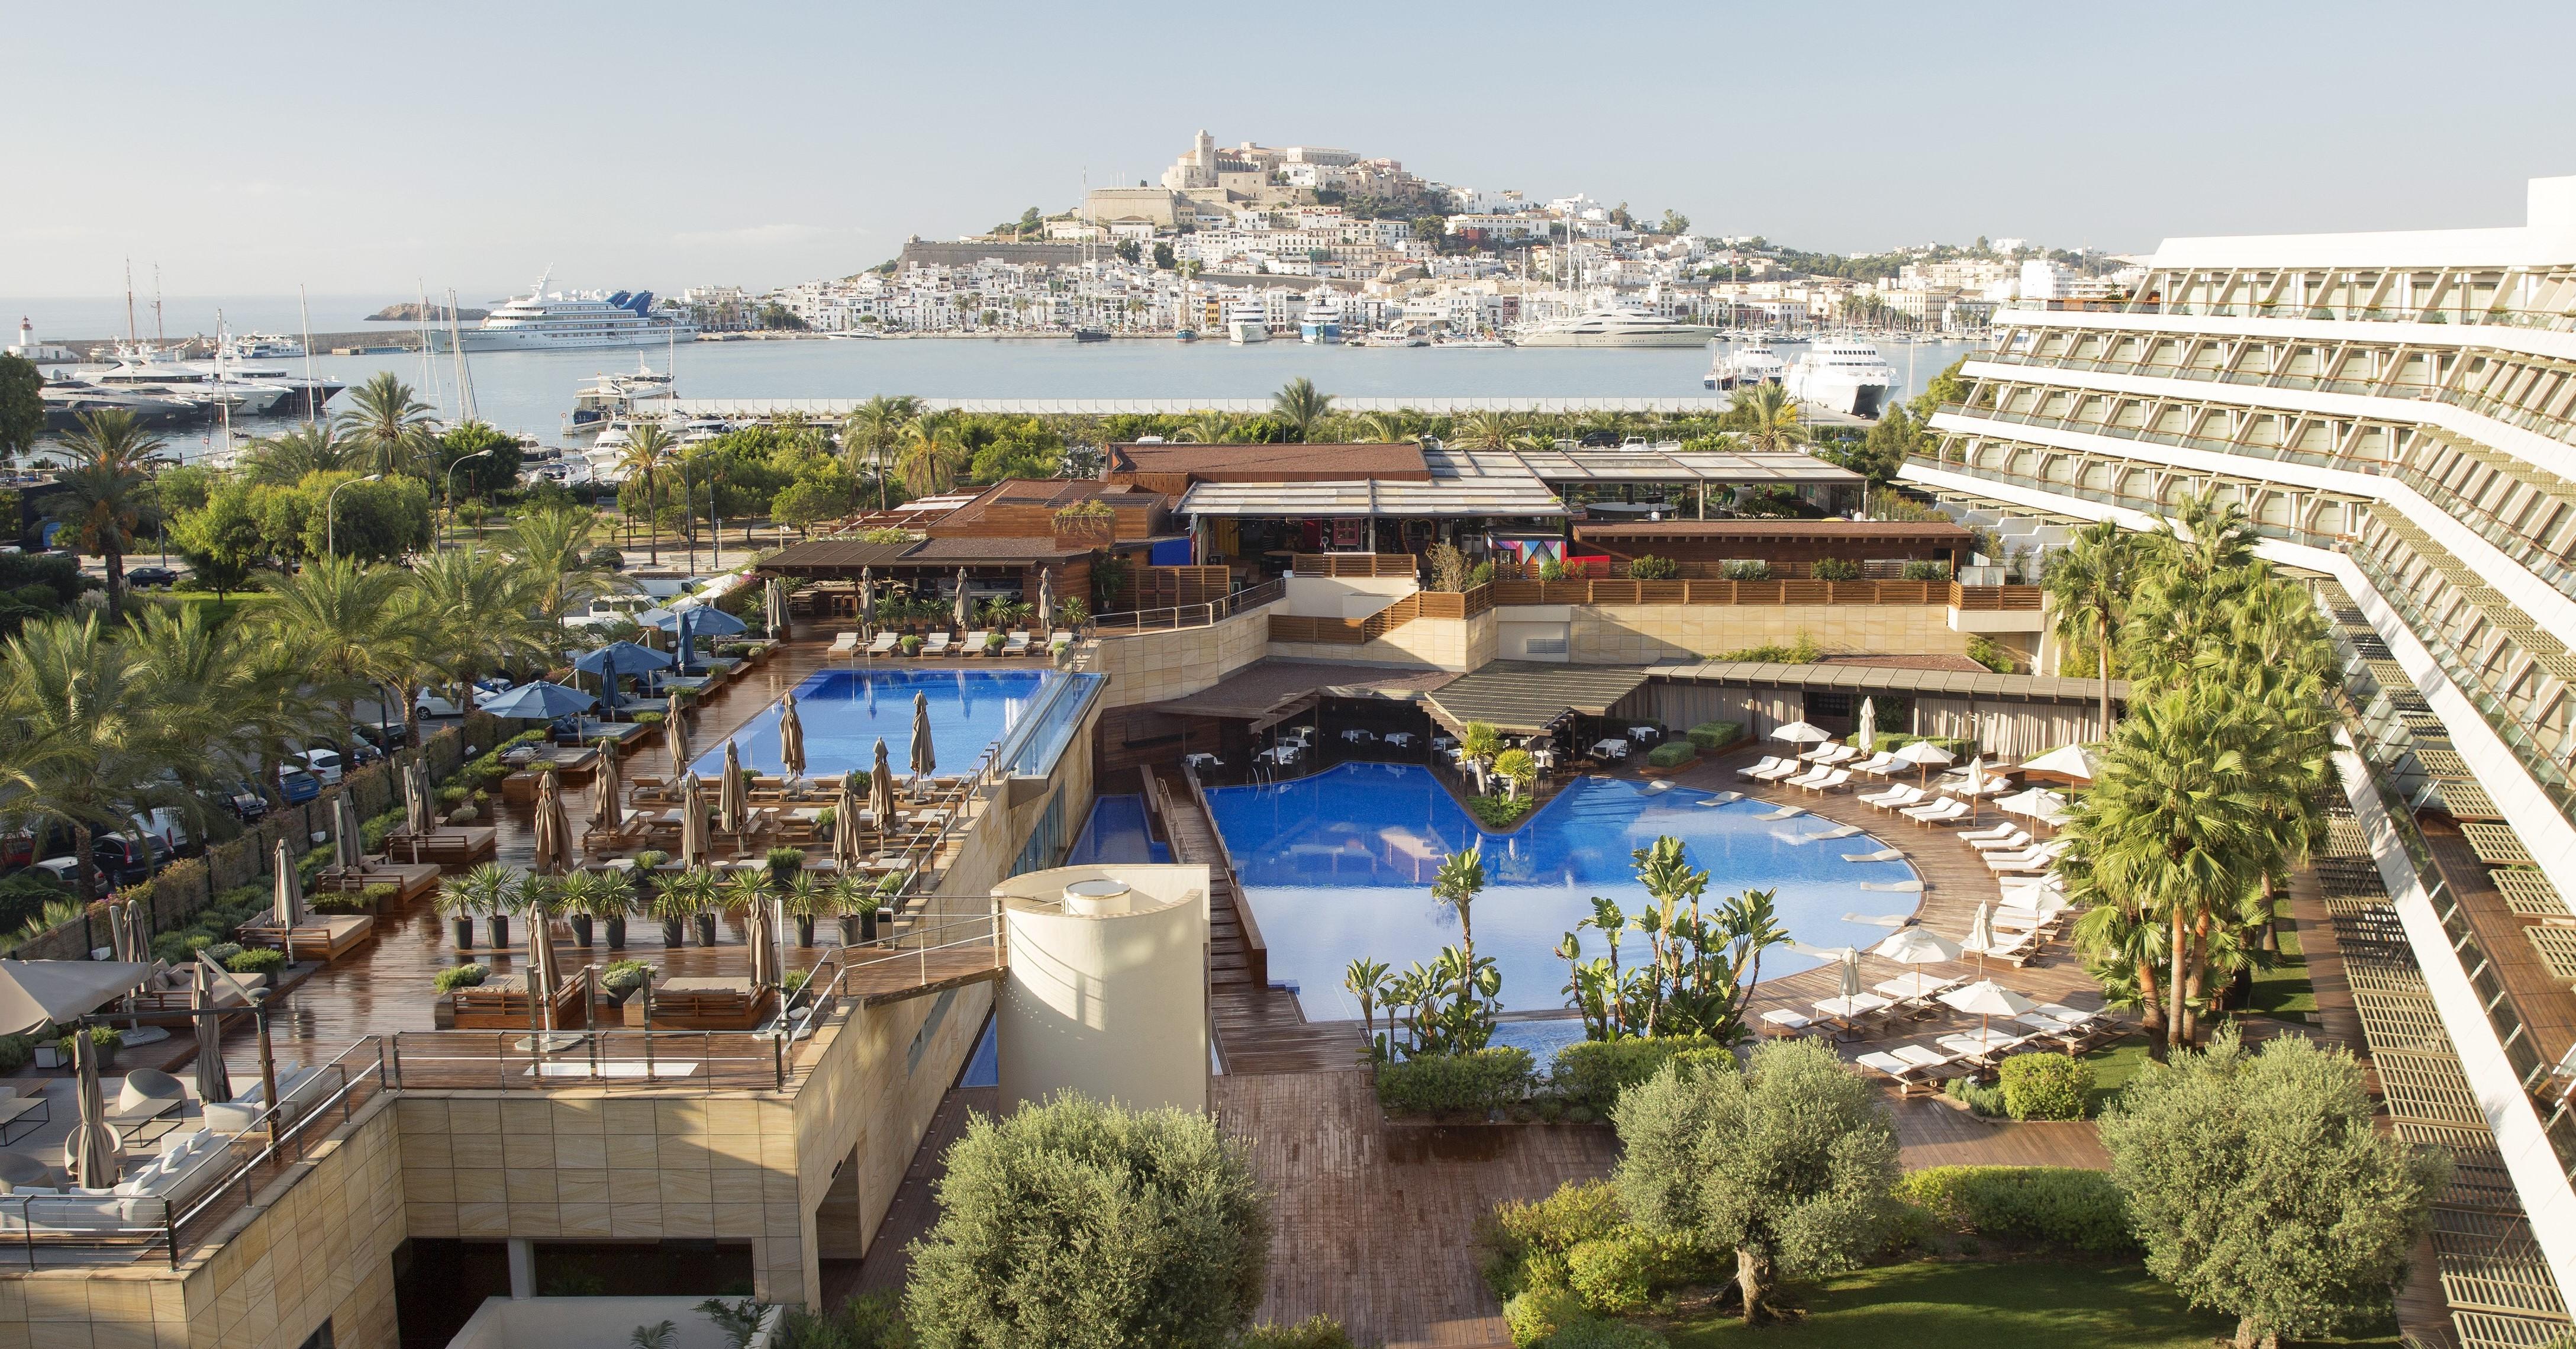 Ibiza Gran Hotel vista general